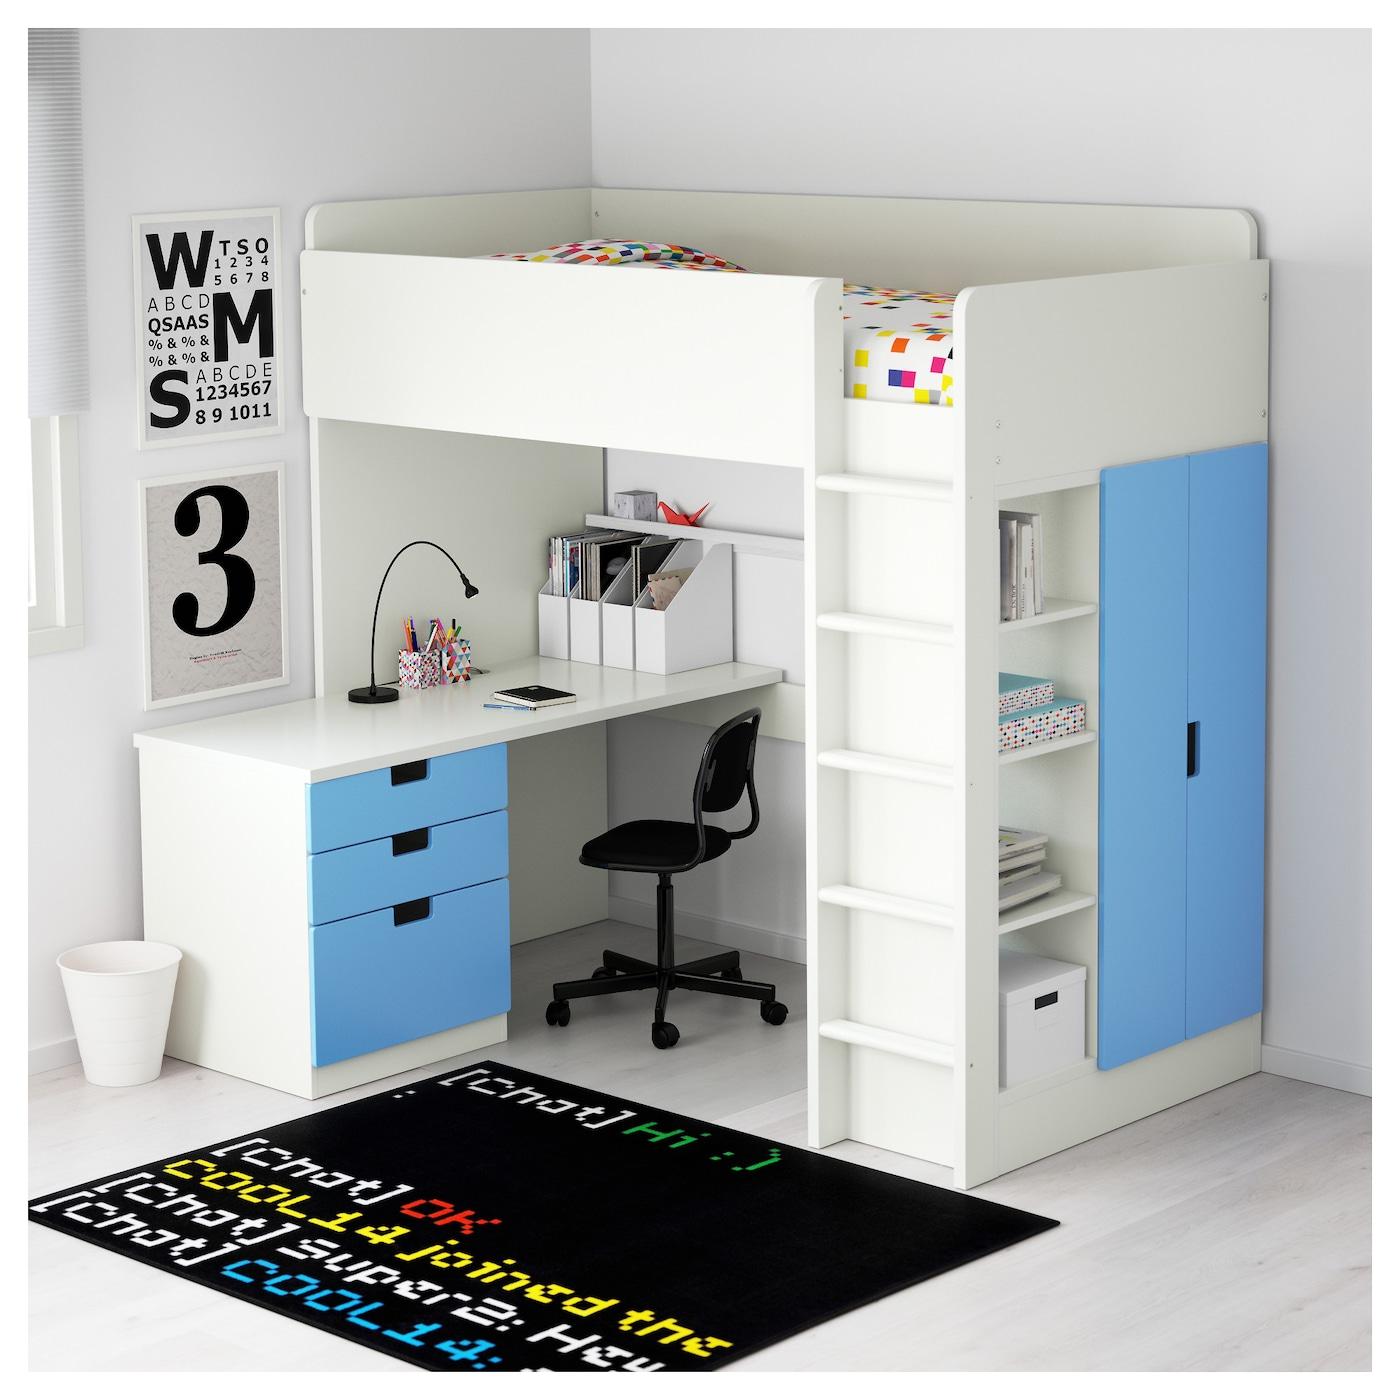 Stuva loft bed combo w 3 drawers 2 doors white blue 207x99x193 cm ikea - Ekia furniture ...